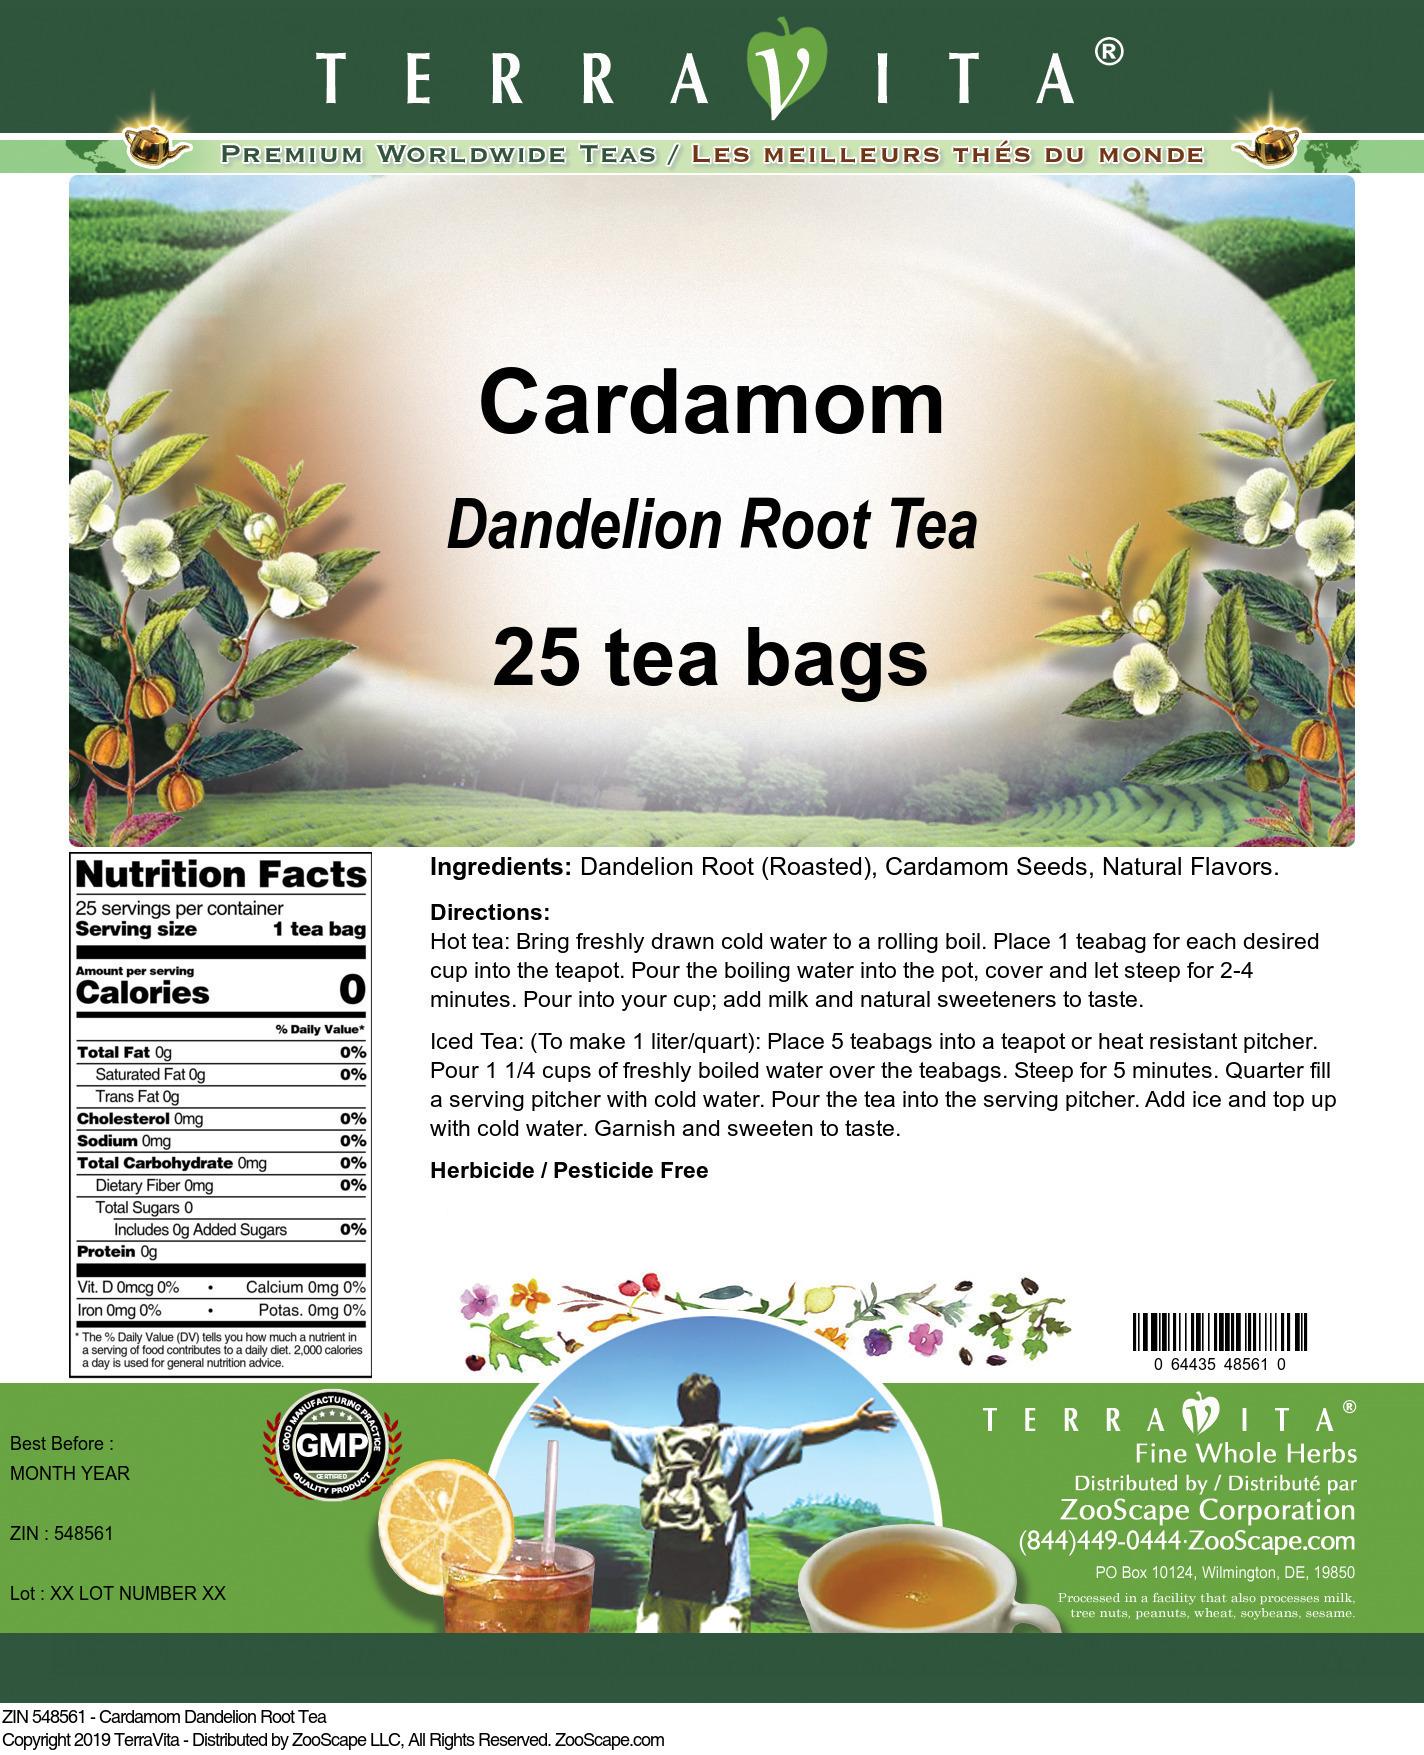 Cardamom Dandelion Root